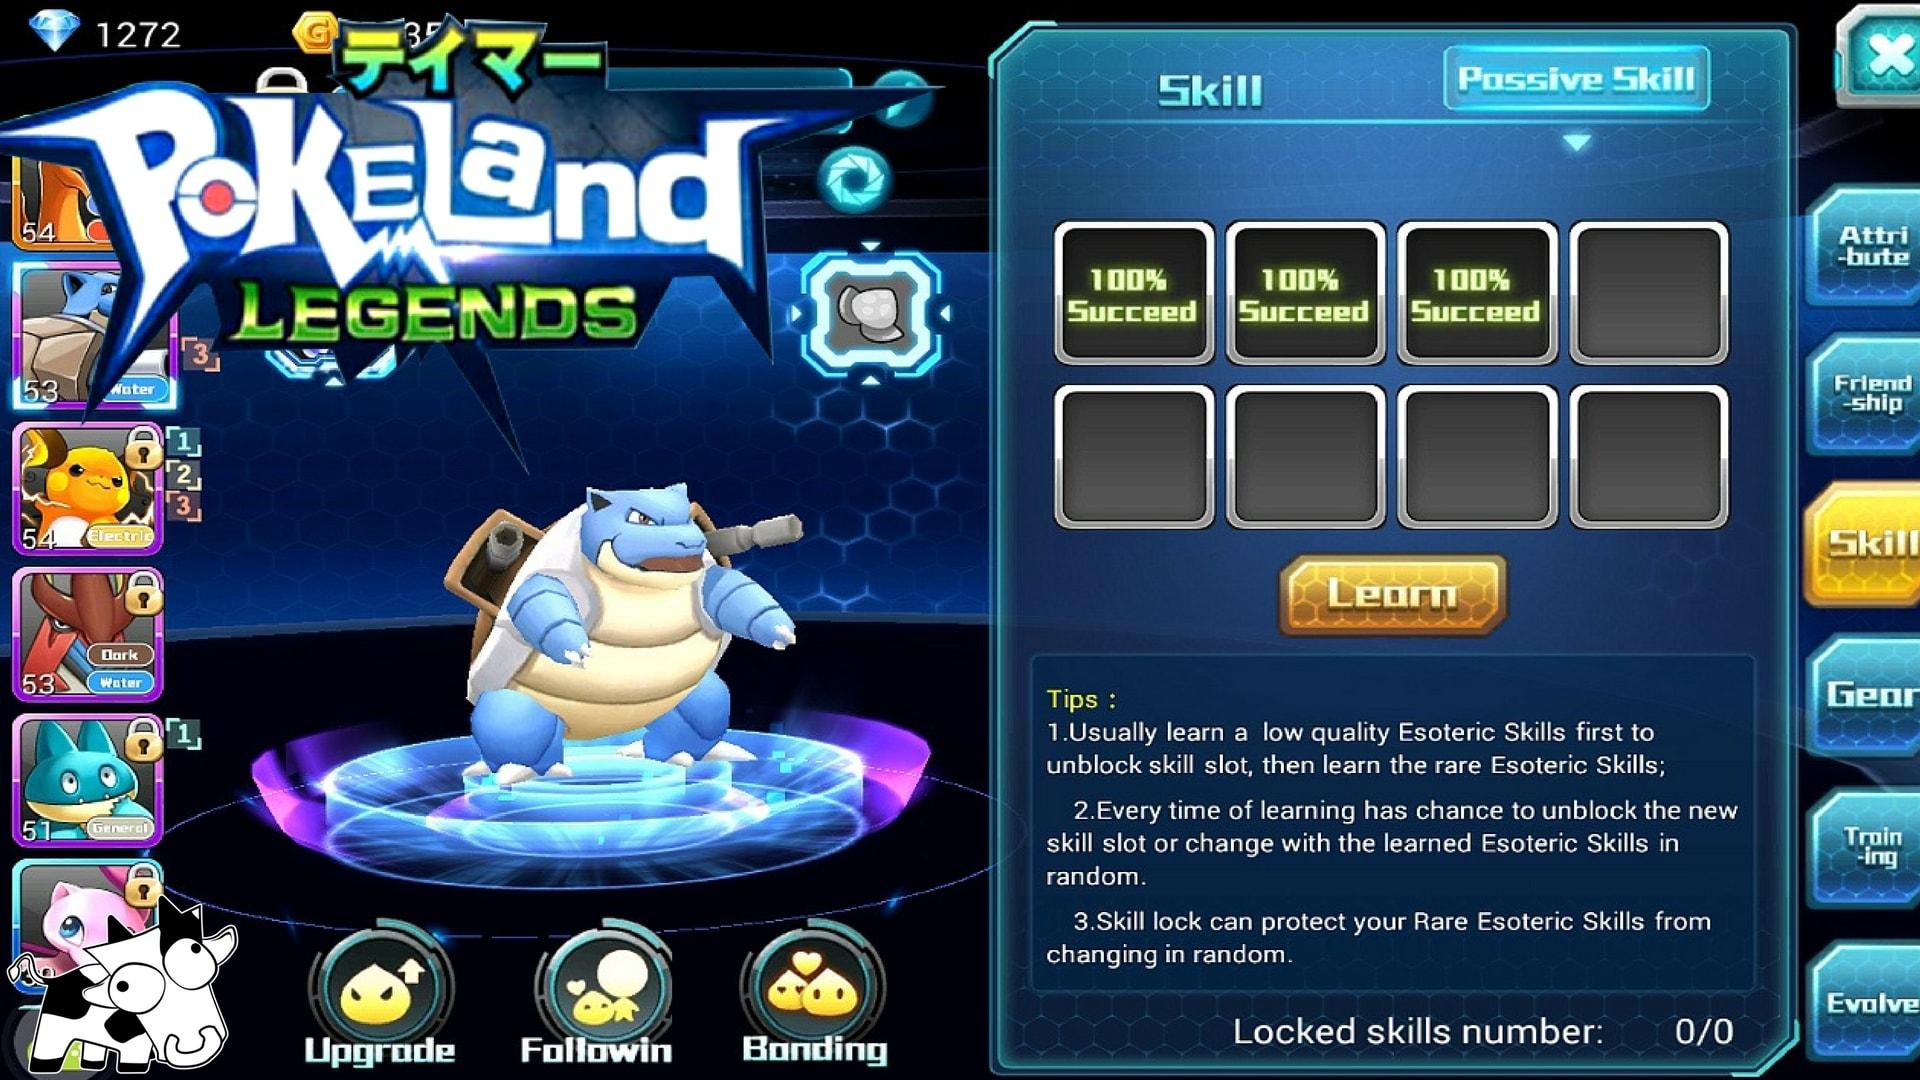 pokeland-legends